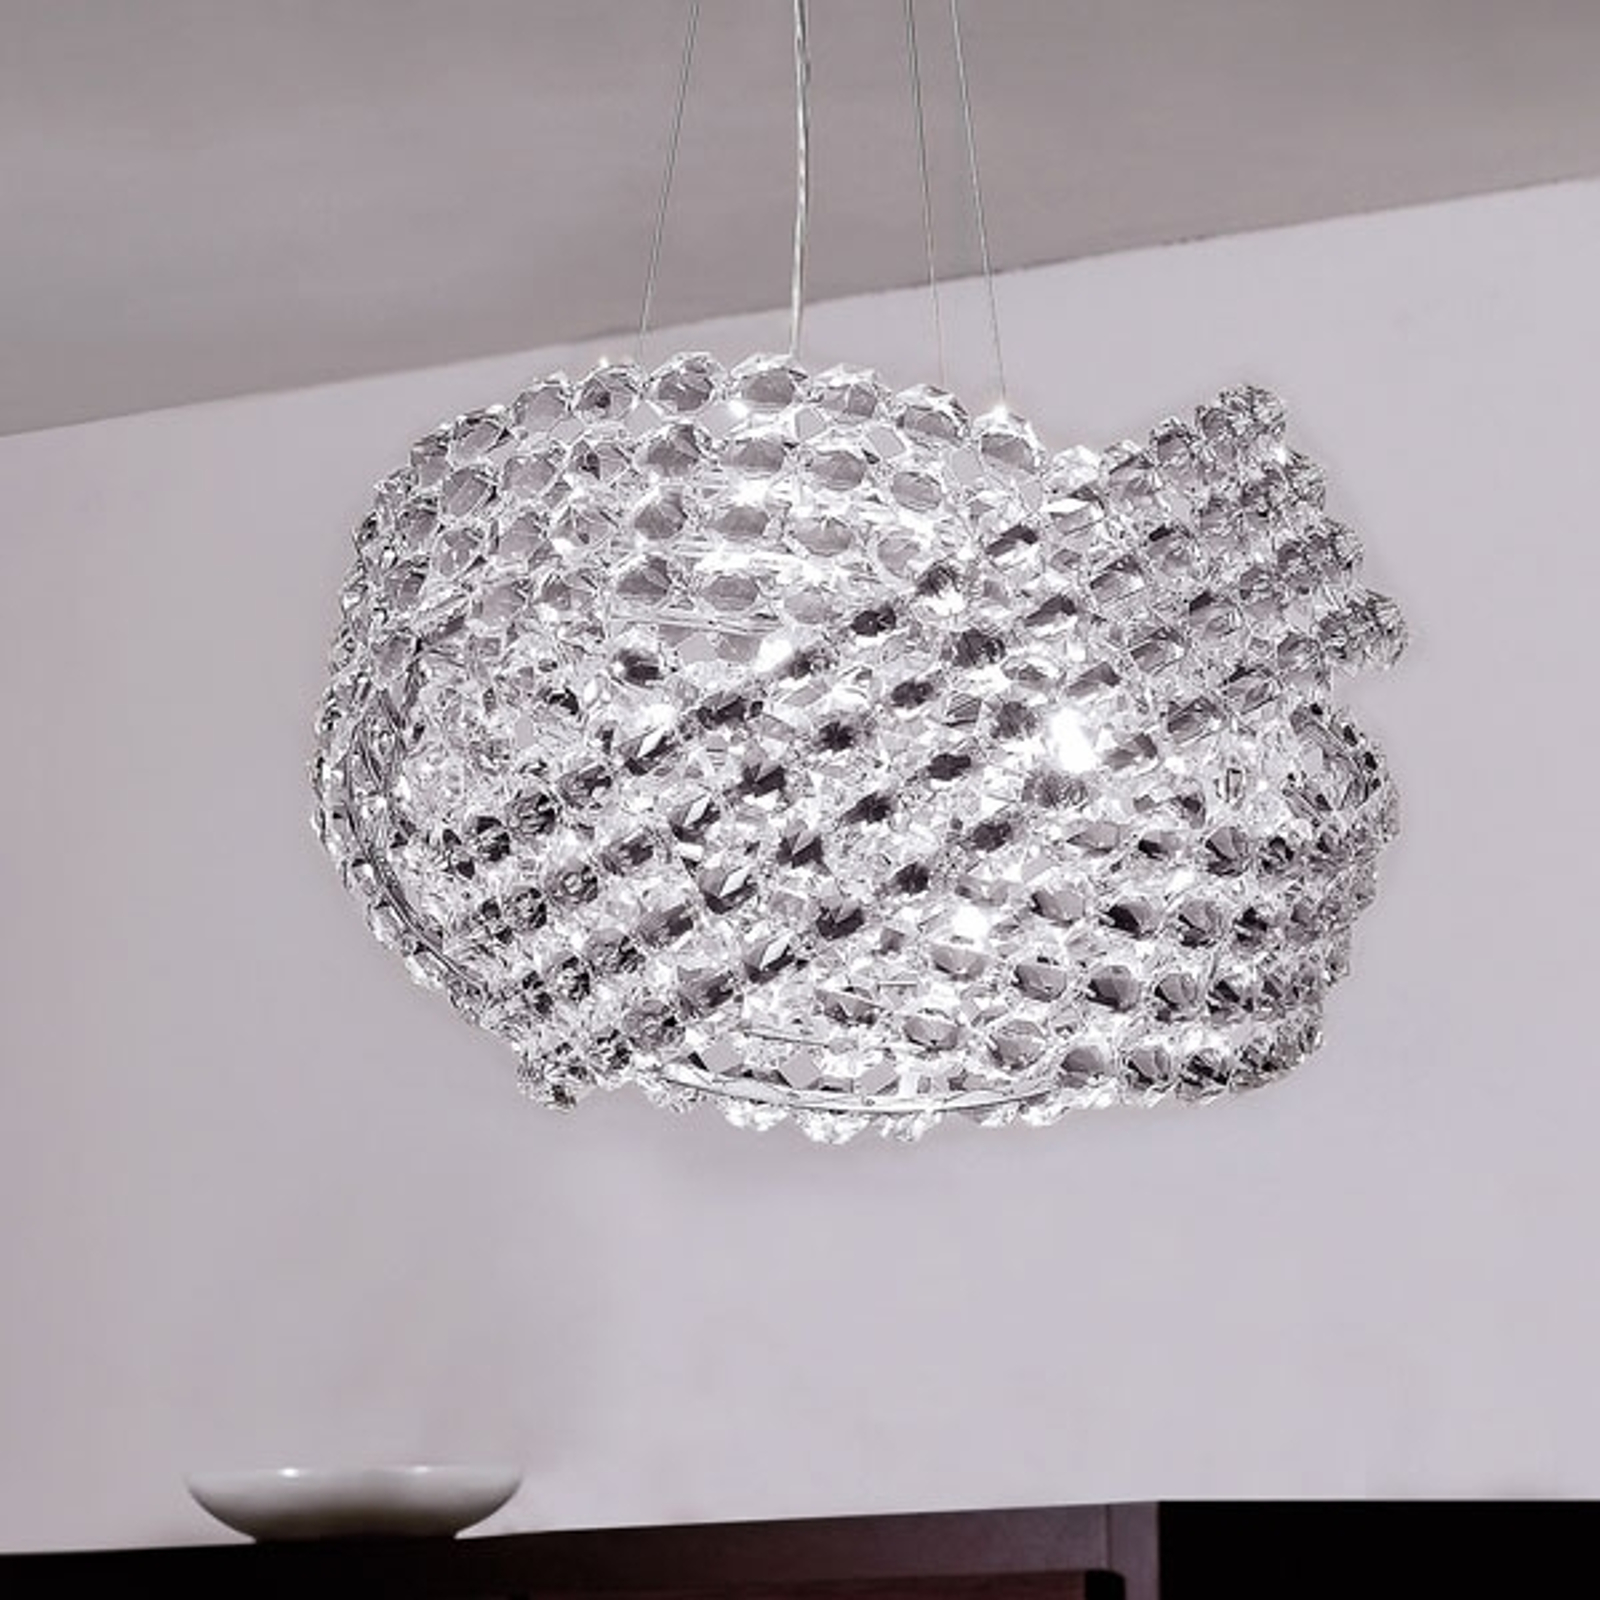 Krystall-pendellampe DIAMANTE Ø 40 cm